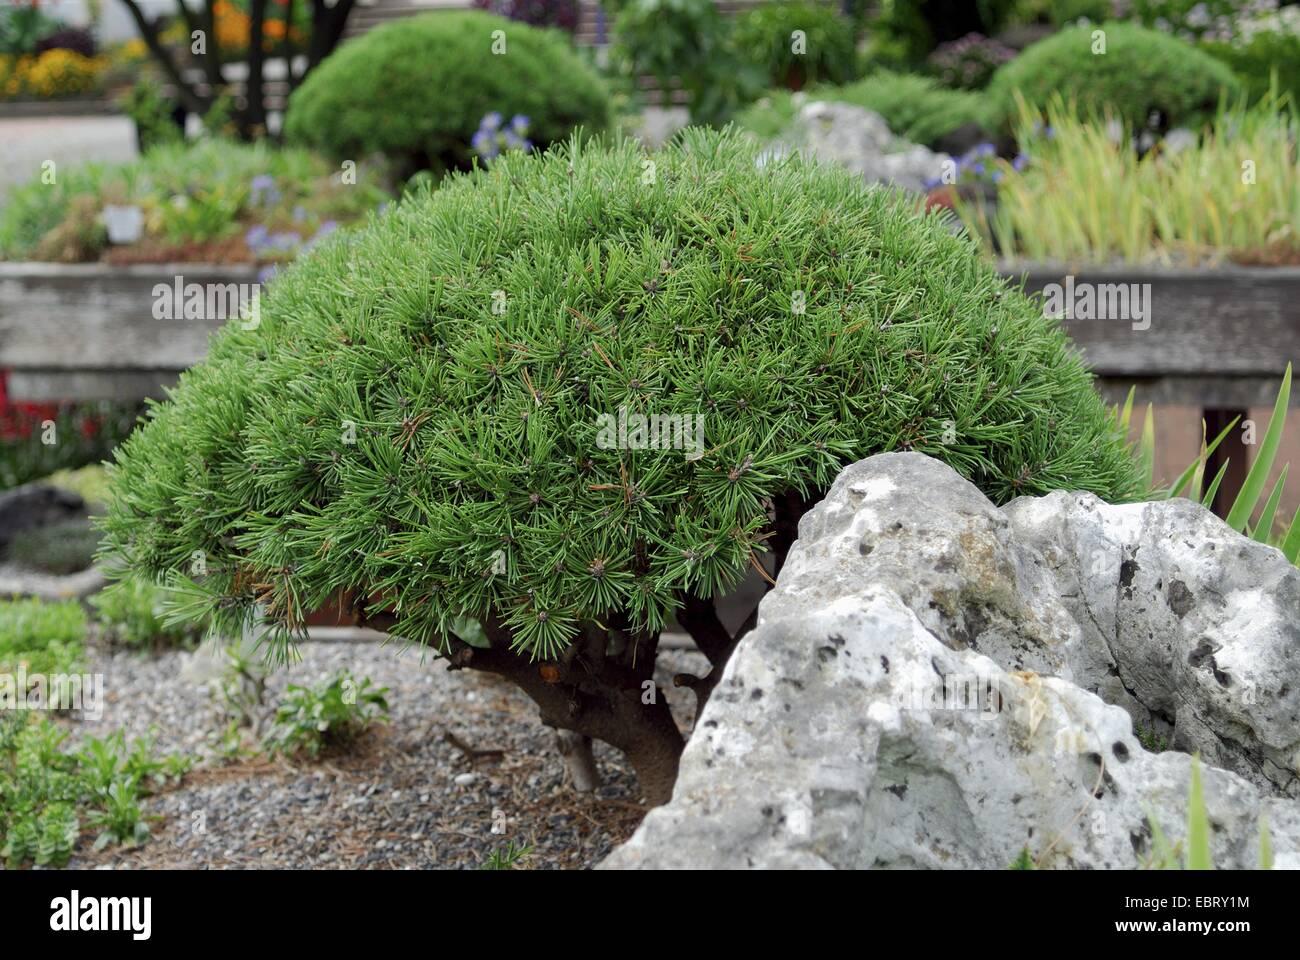 Mountain pine, Mugo pine (Pinus mugo 'Mops', Pinus mugo Mops), cultivar Mops - Stock Image